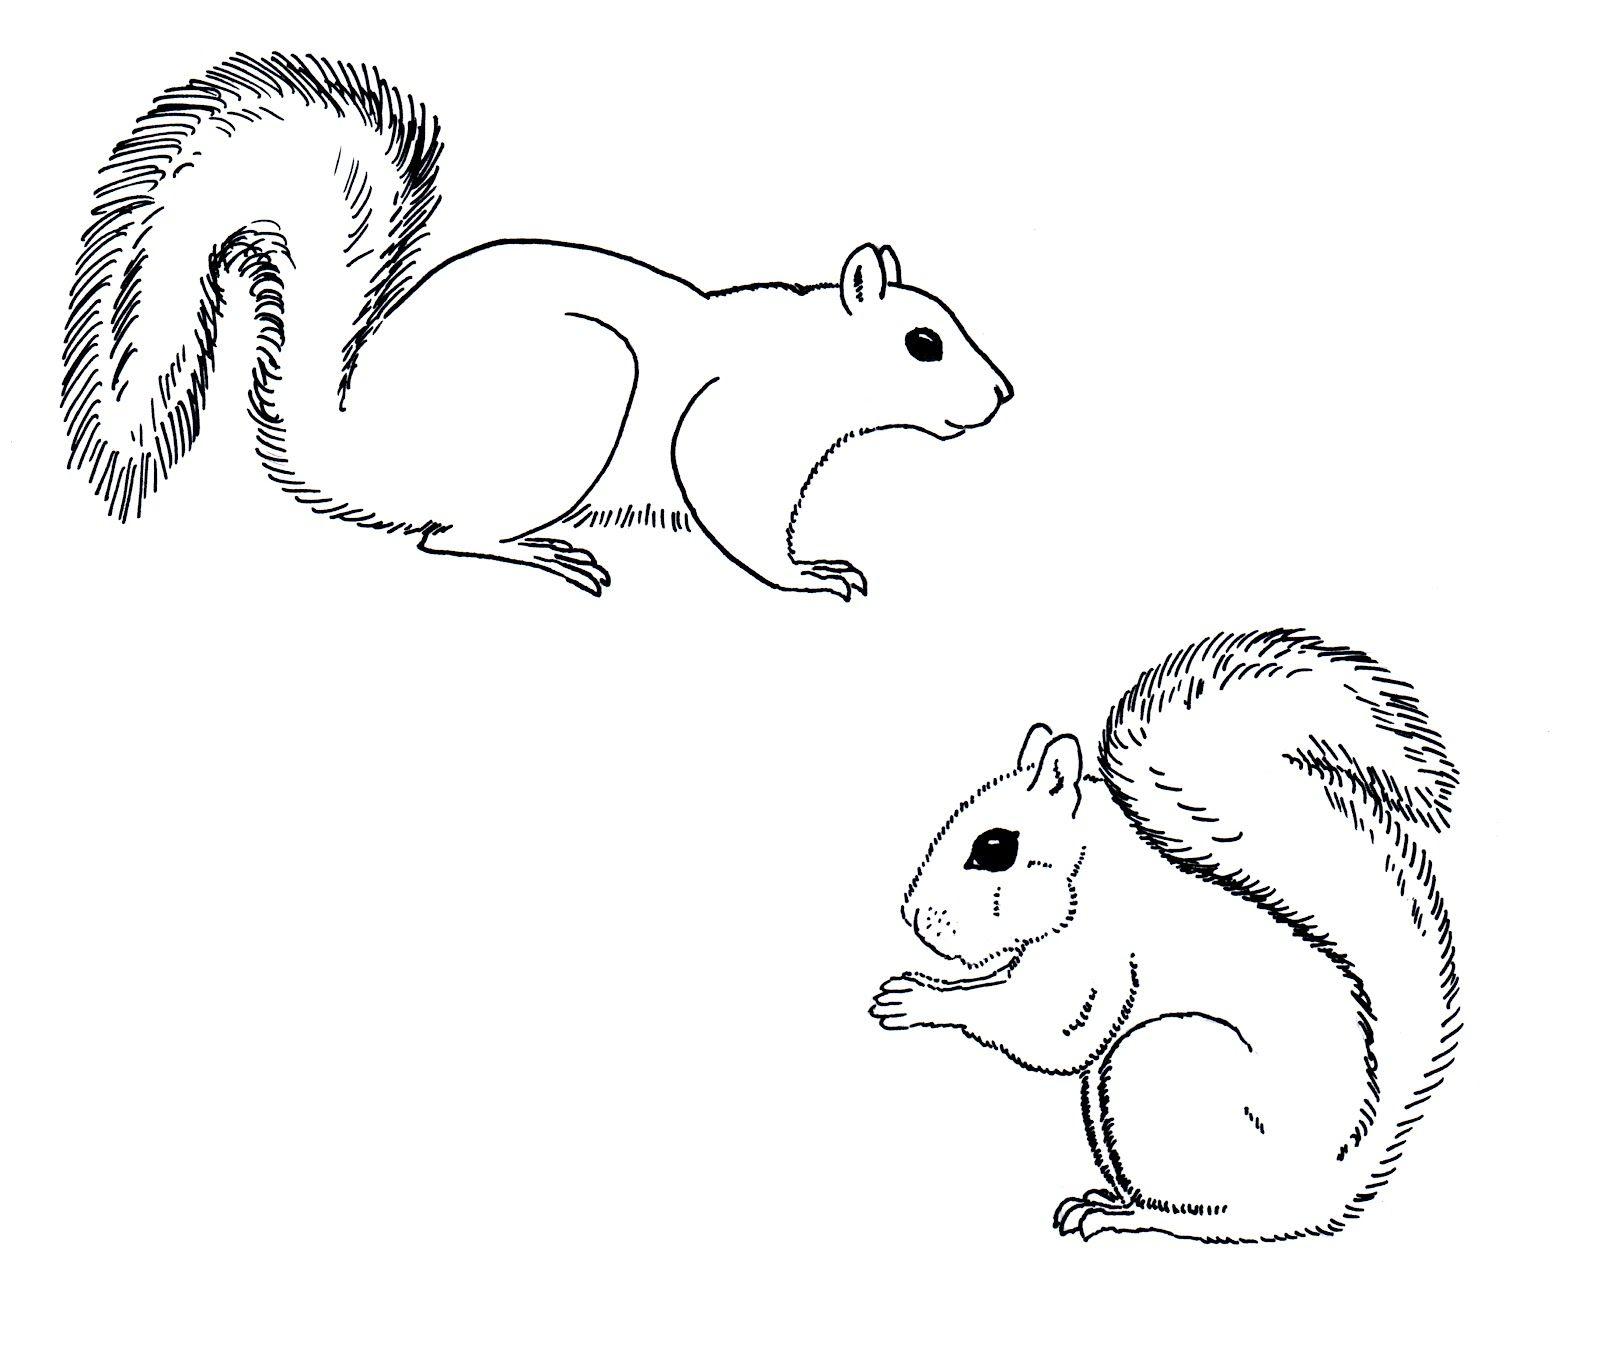 Line Drawing Squirrel : Squirrel line art google search animal vectors pinterest